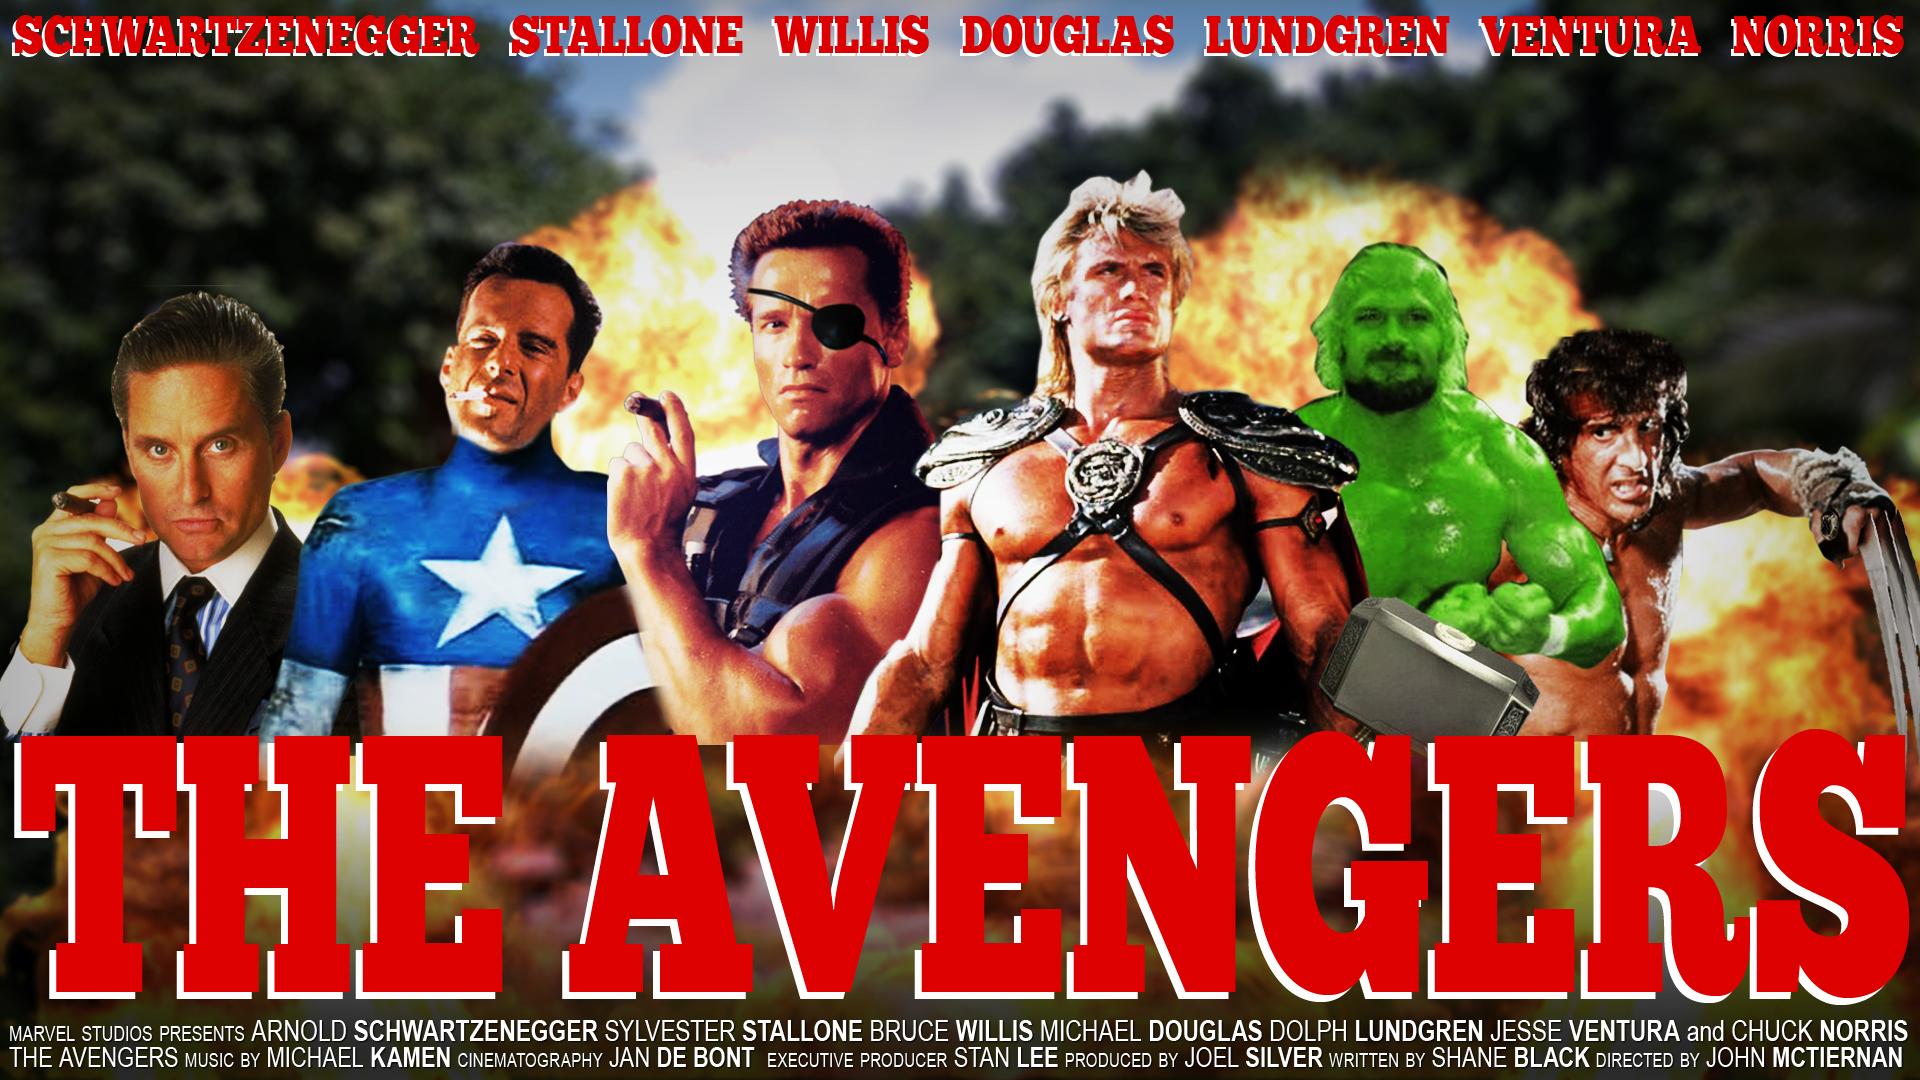 Avengers Background wallpaper   578630 1920x1080